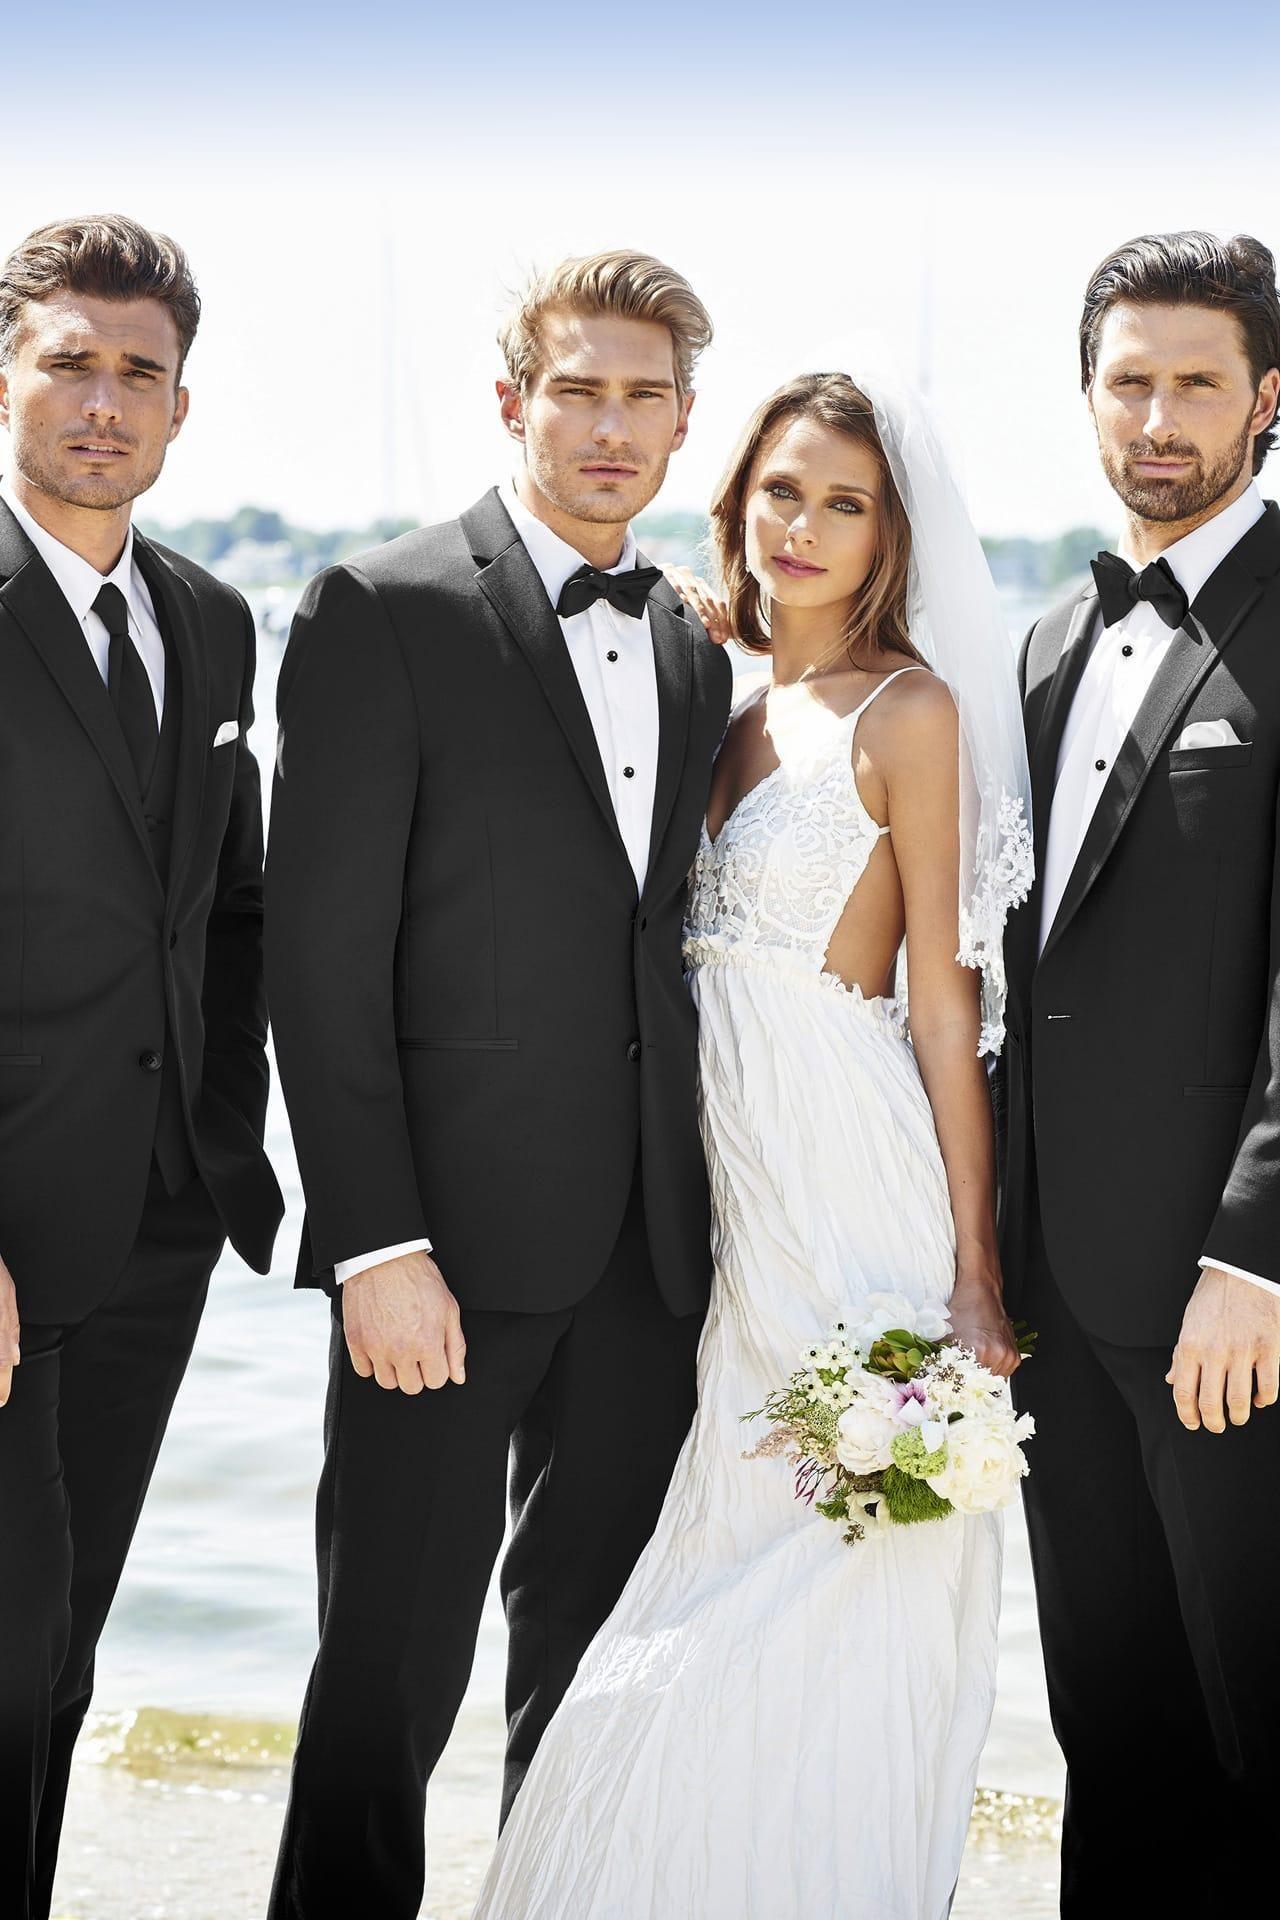 Michael Kors Sterling Wedding Suit Slim Fit Suit | Jim\'s Formal Wear ...